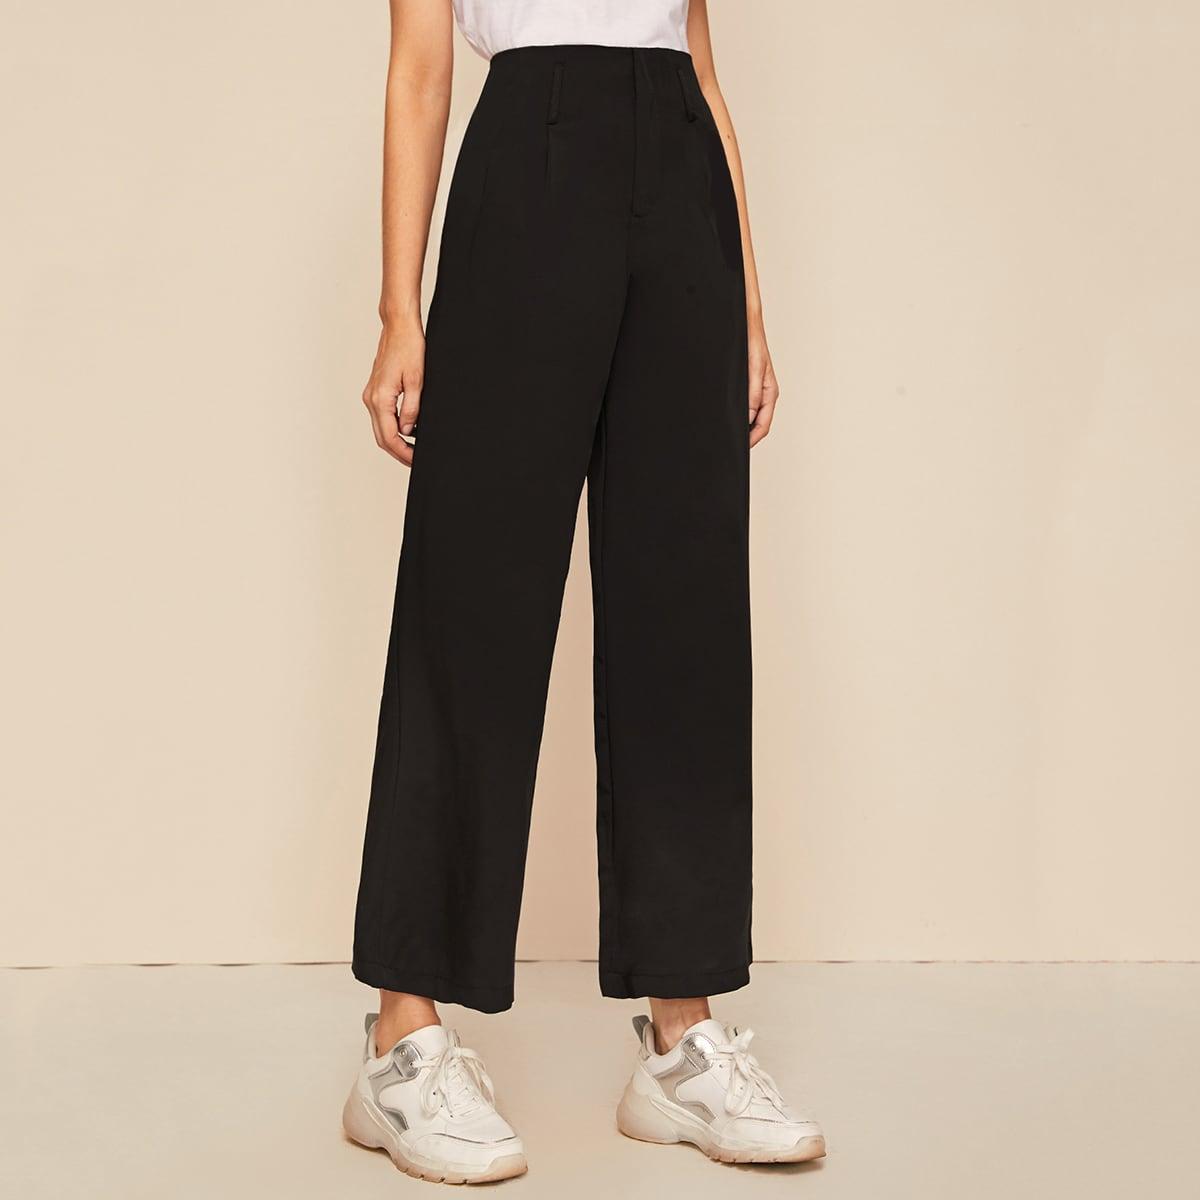 Широкие брюки с карманом фото